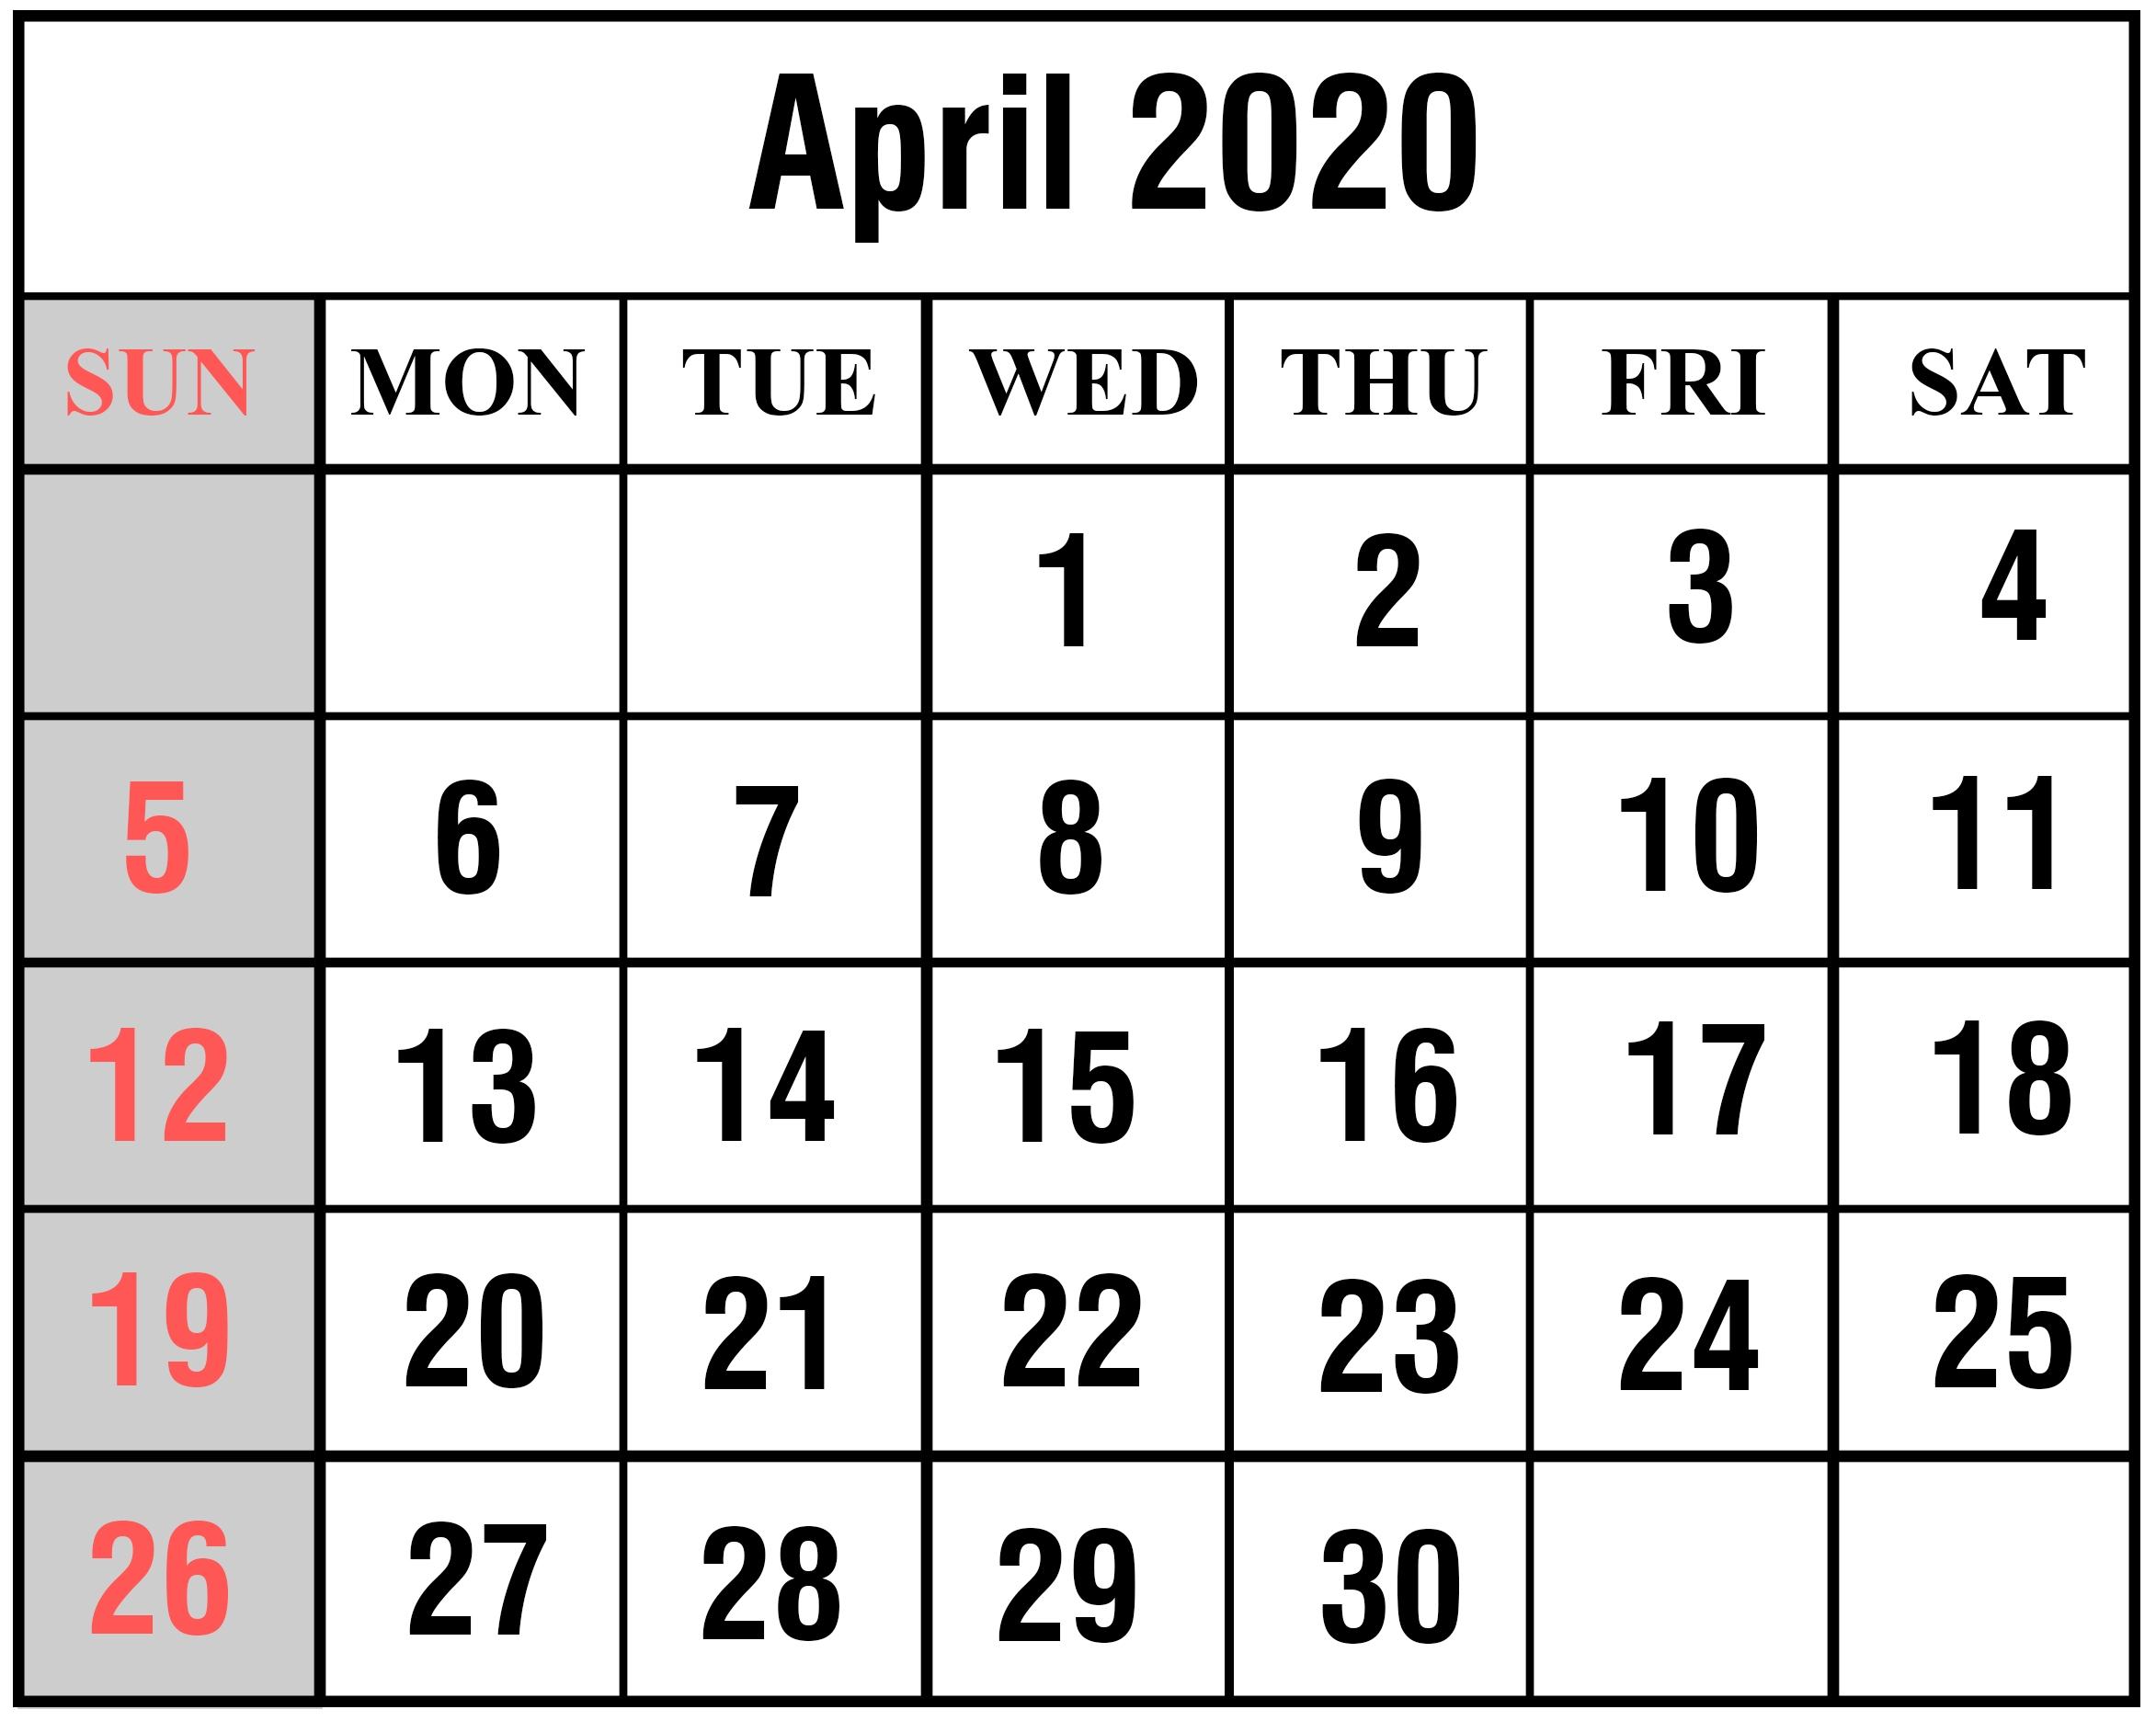 April 2020 Calendar Printable Template In Pdf, Word, Excel